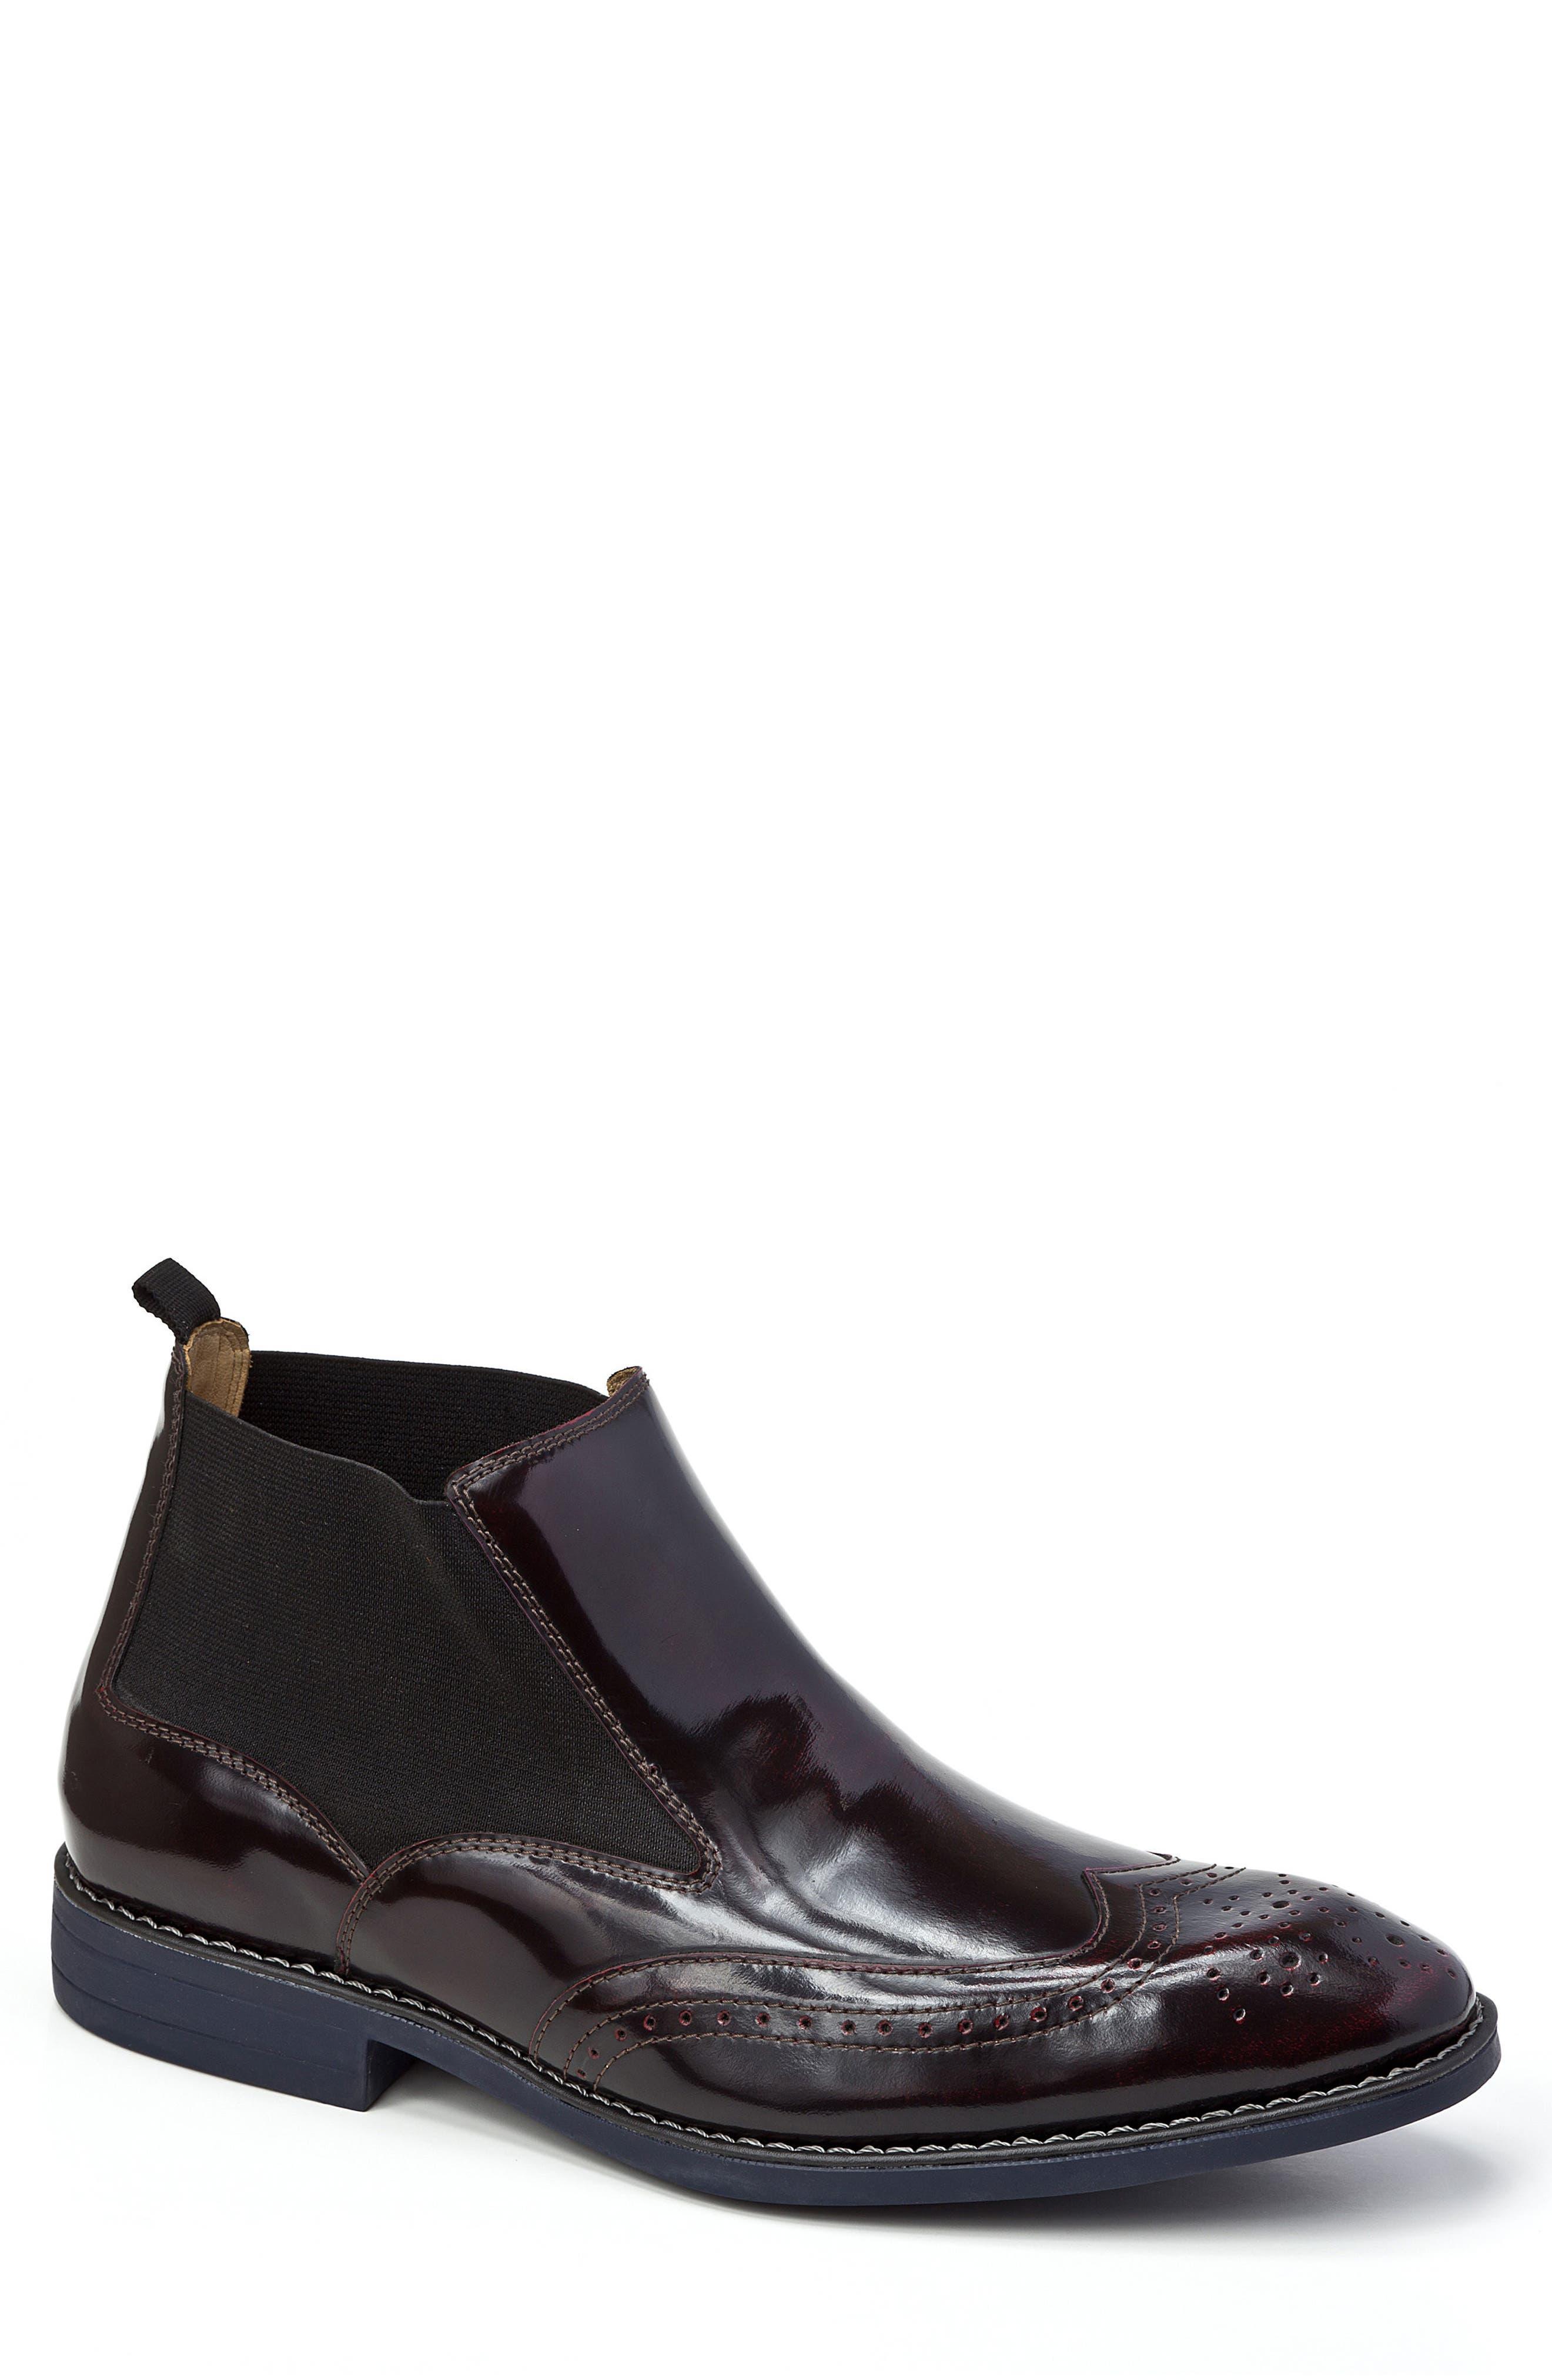 Emanuel Chelsea Boot,                         Main,                         color, 930